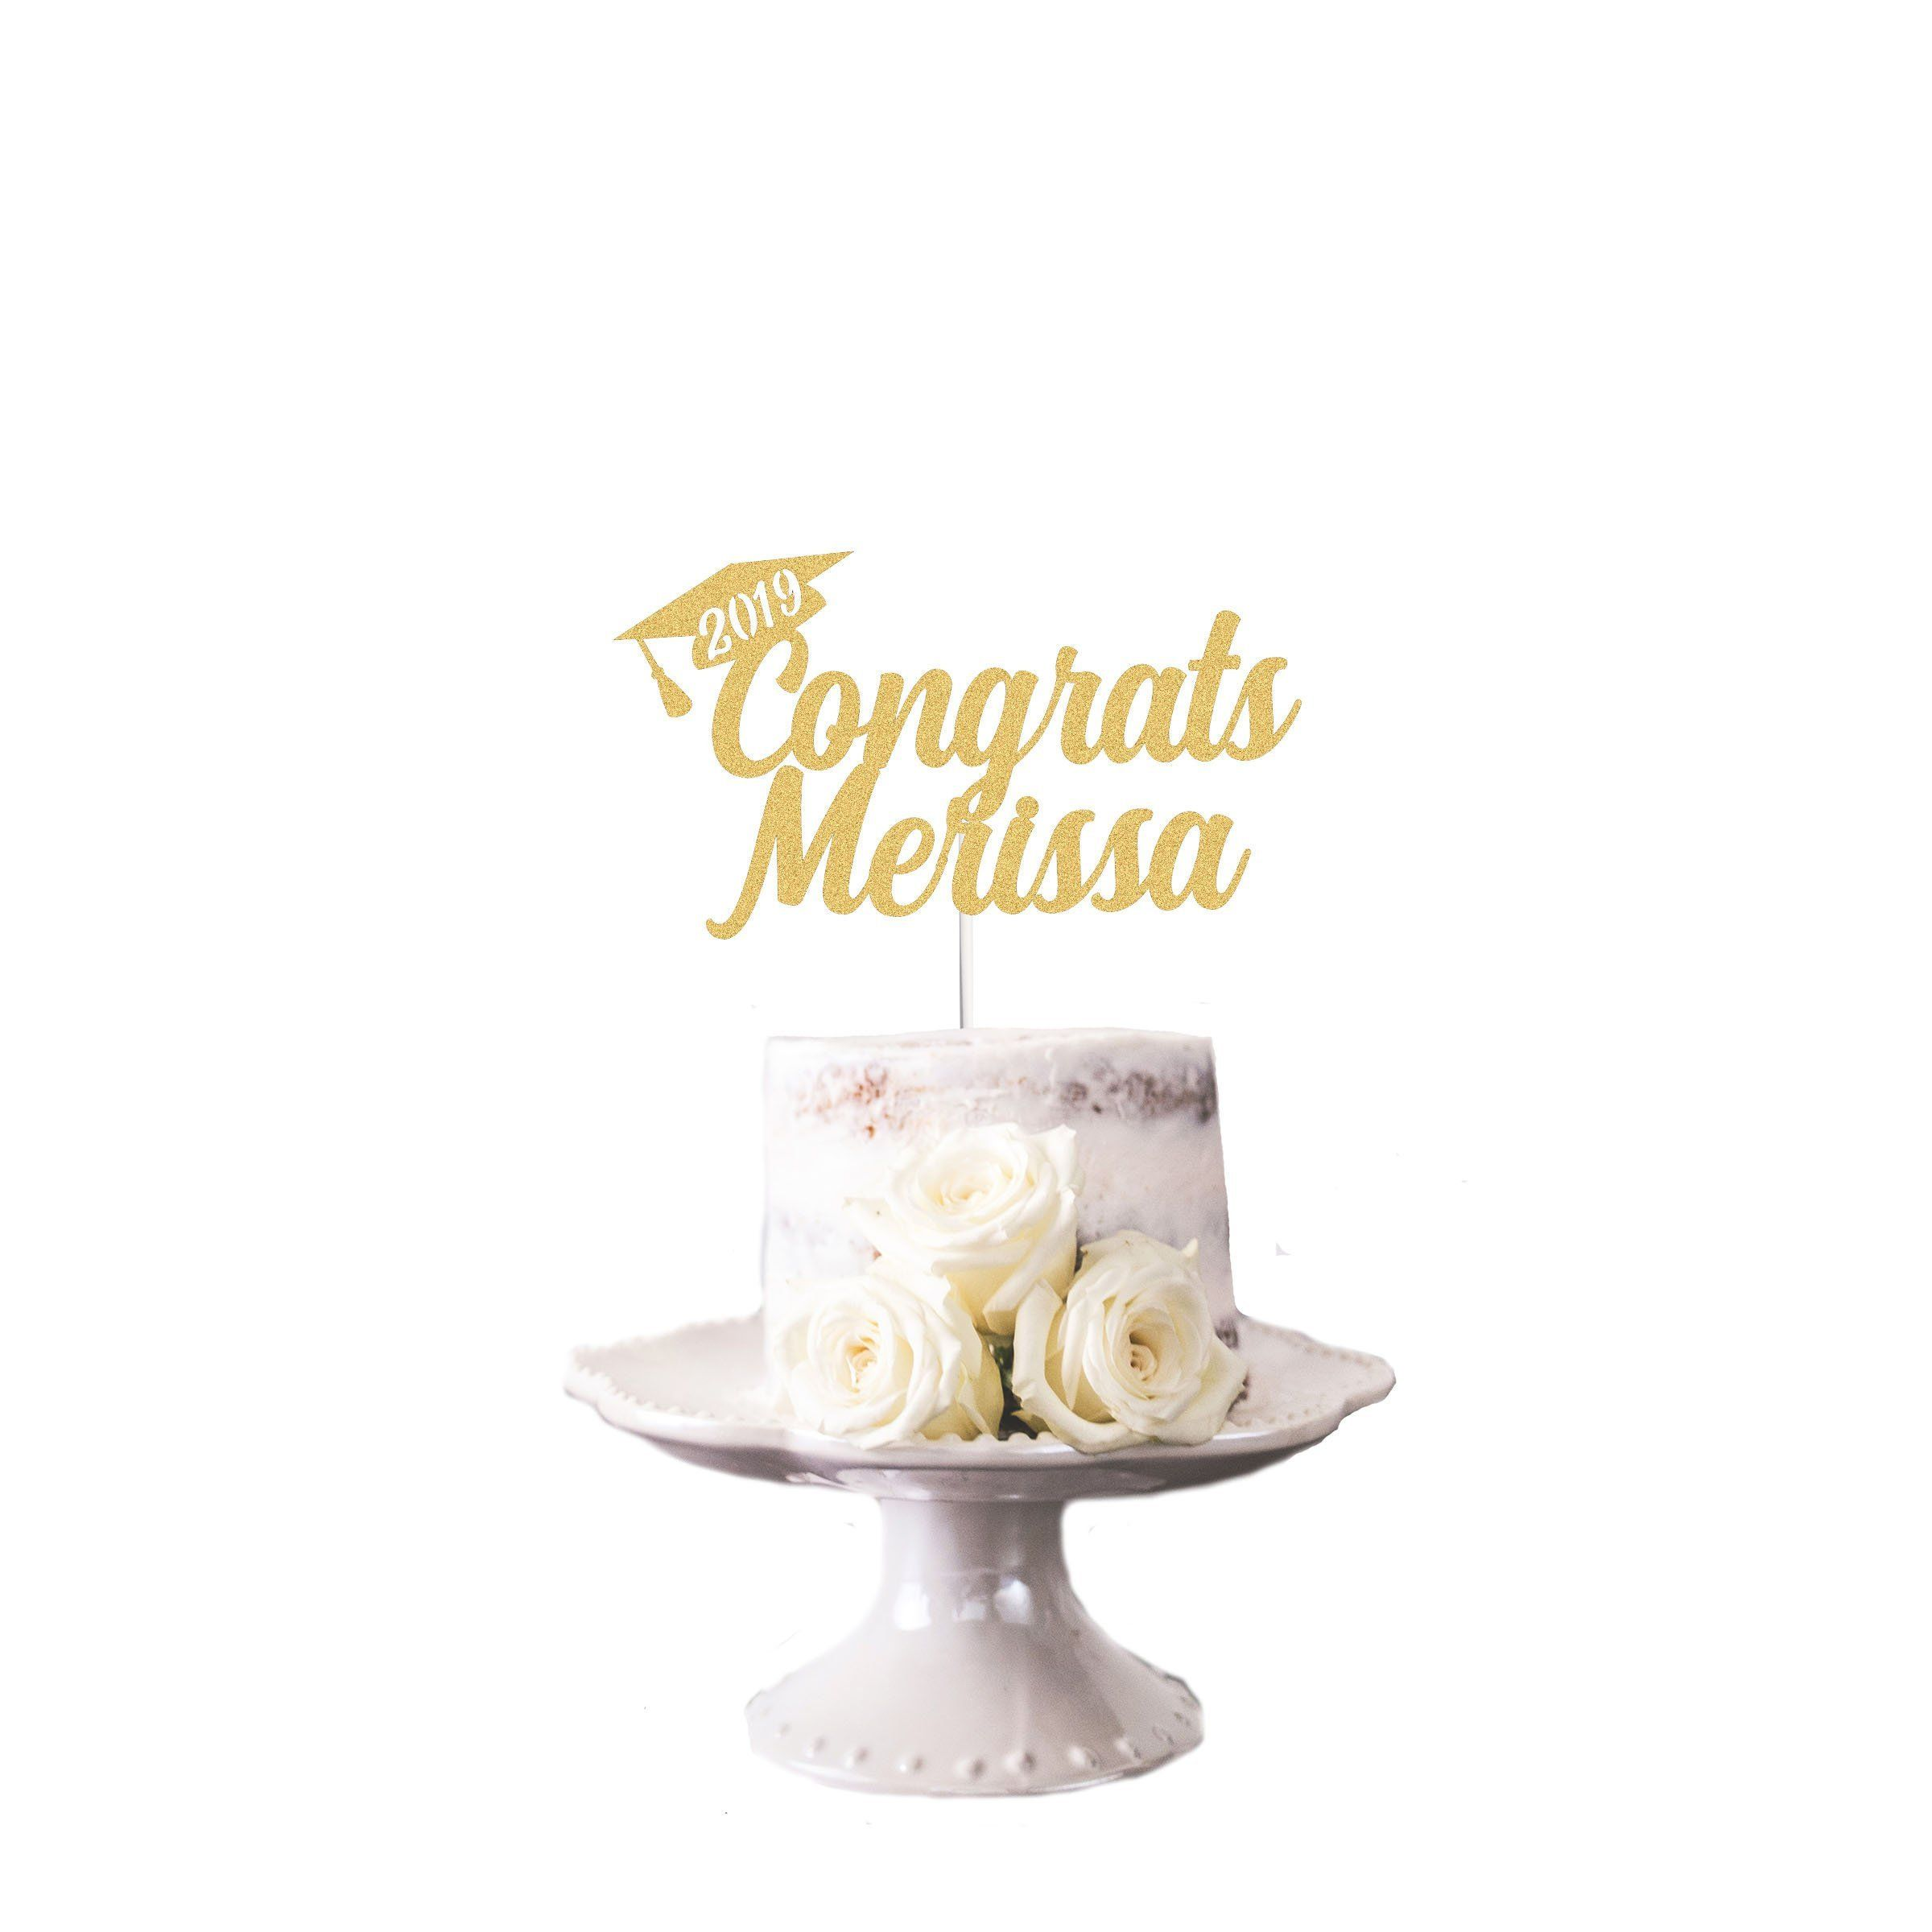 Personalised Name Graduation 2019 Black Glitter Card Cake Topper graduation